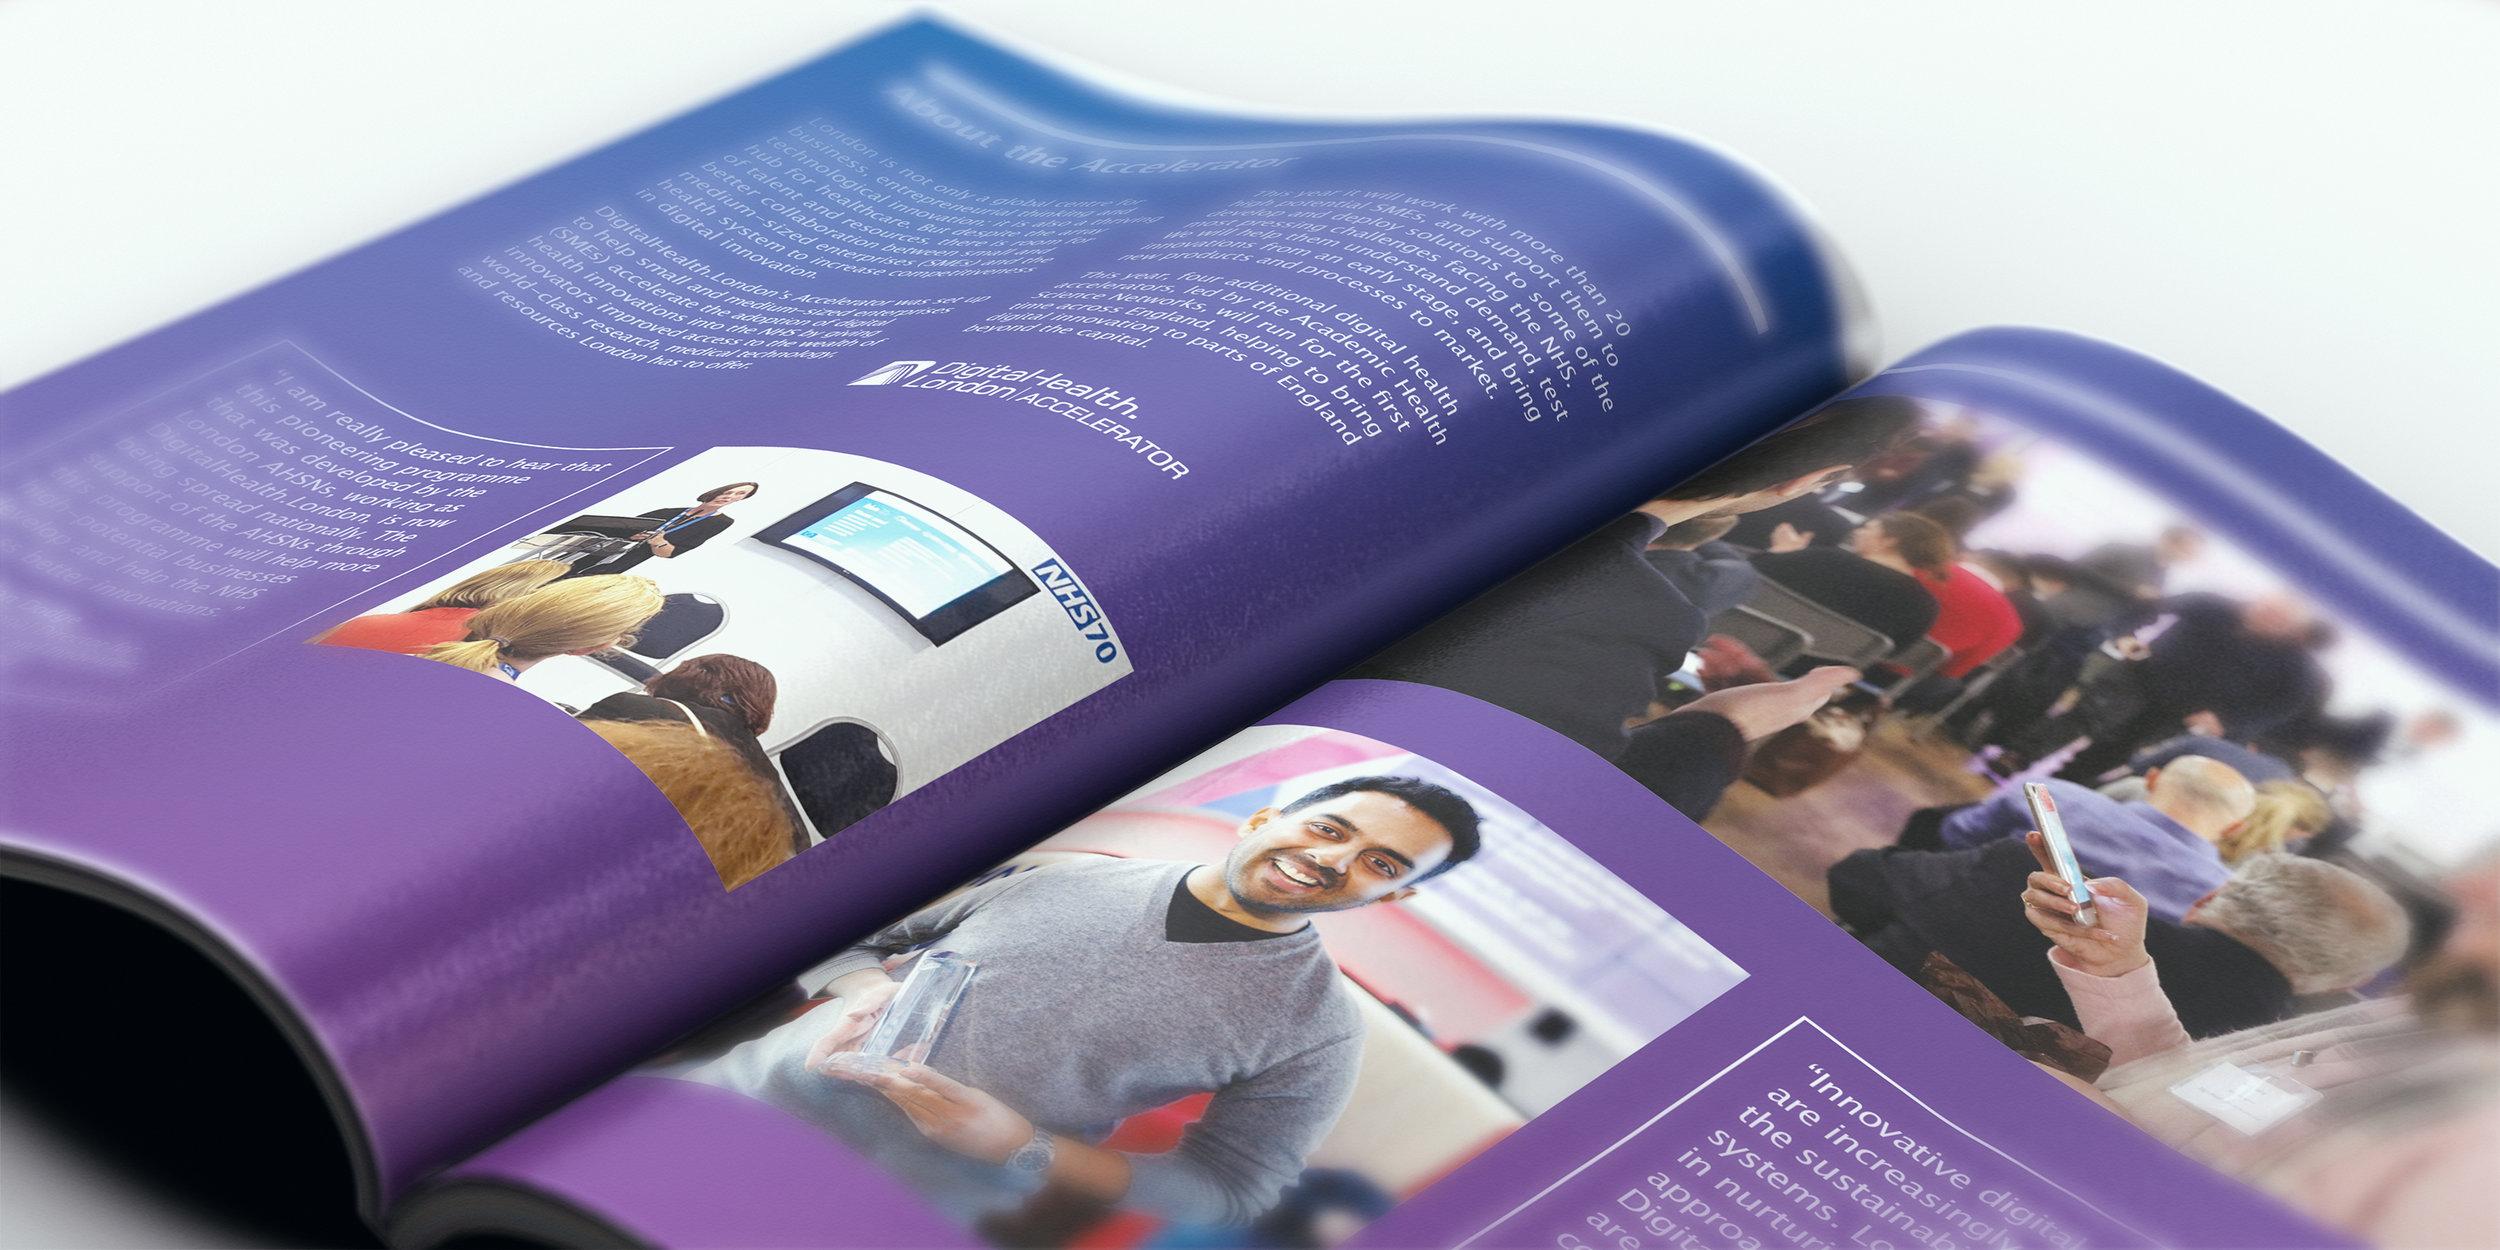 Magazine Close Up 01.jpg